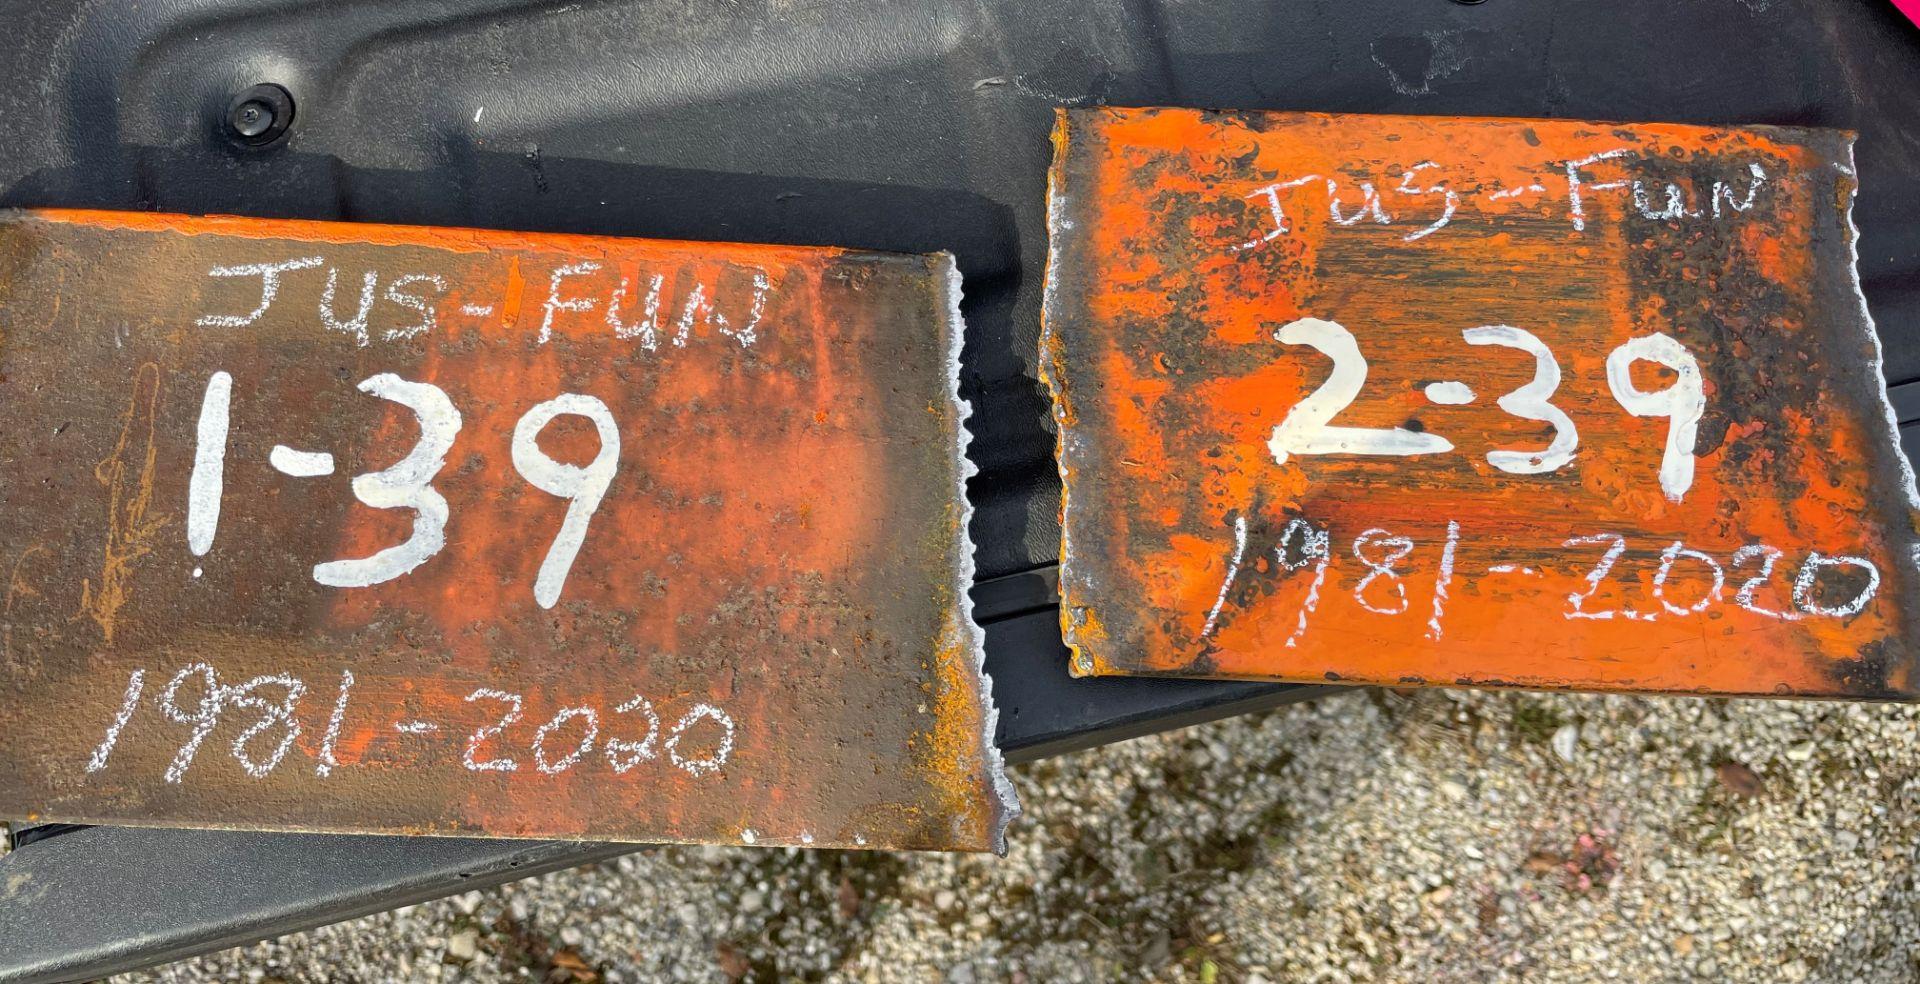 "1 of 39 commemorative 8"" piece of Jus-Fun Go-kart guard rail"